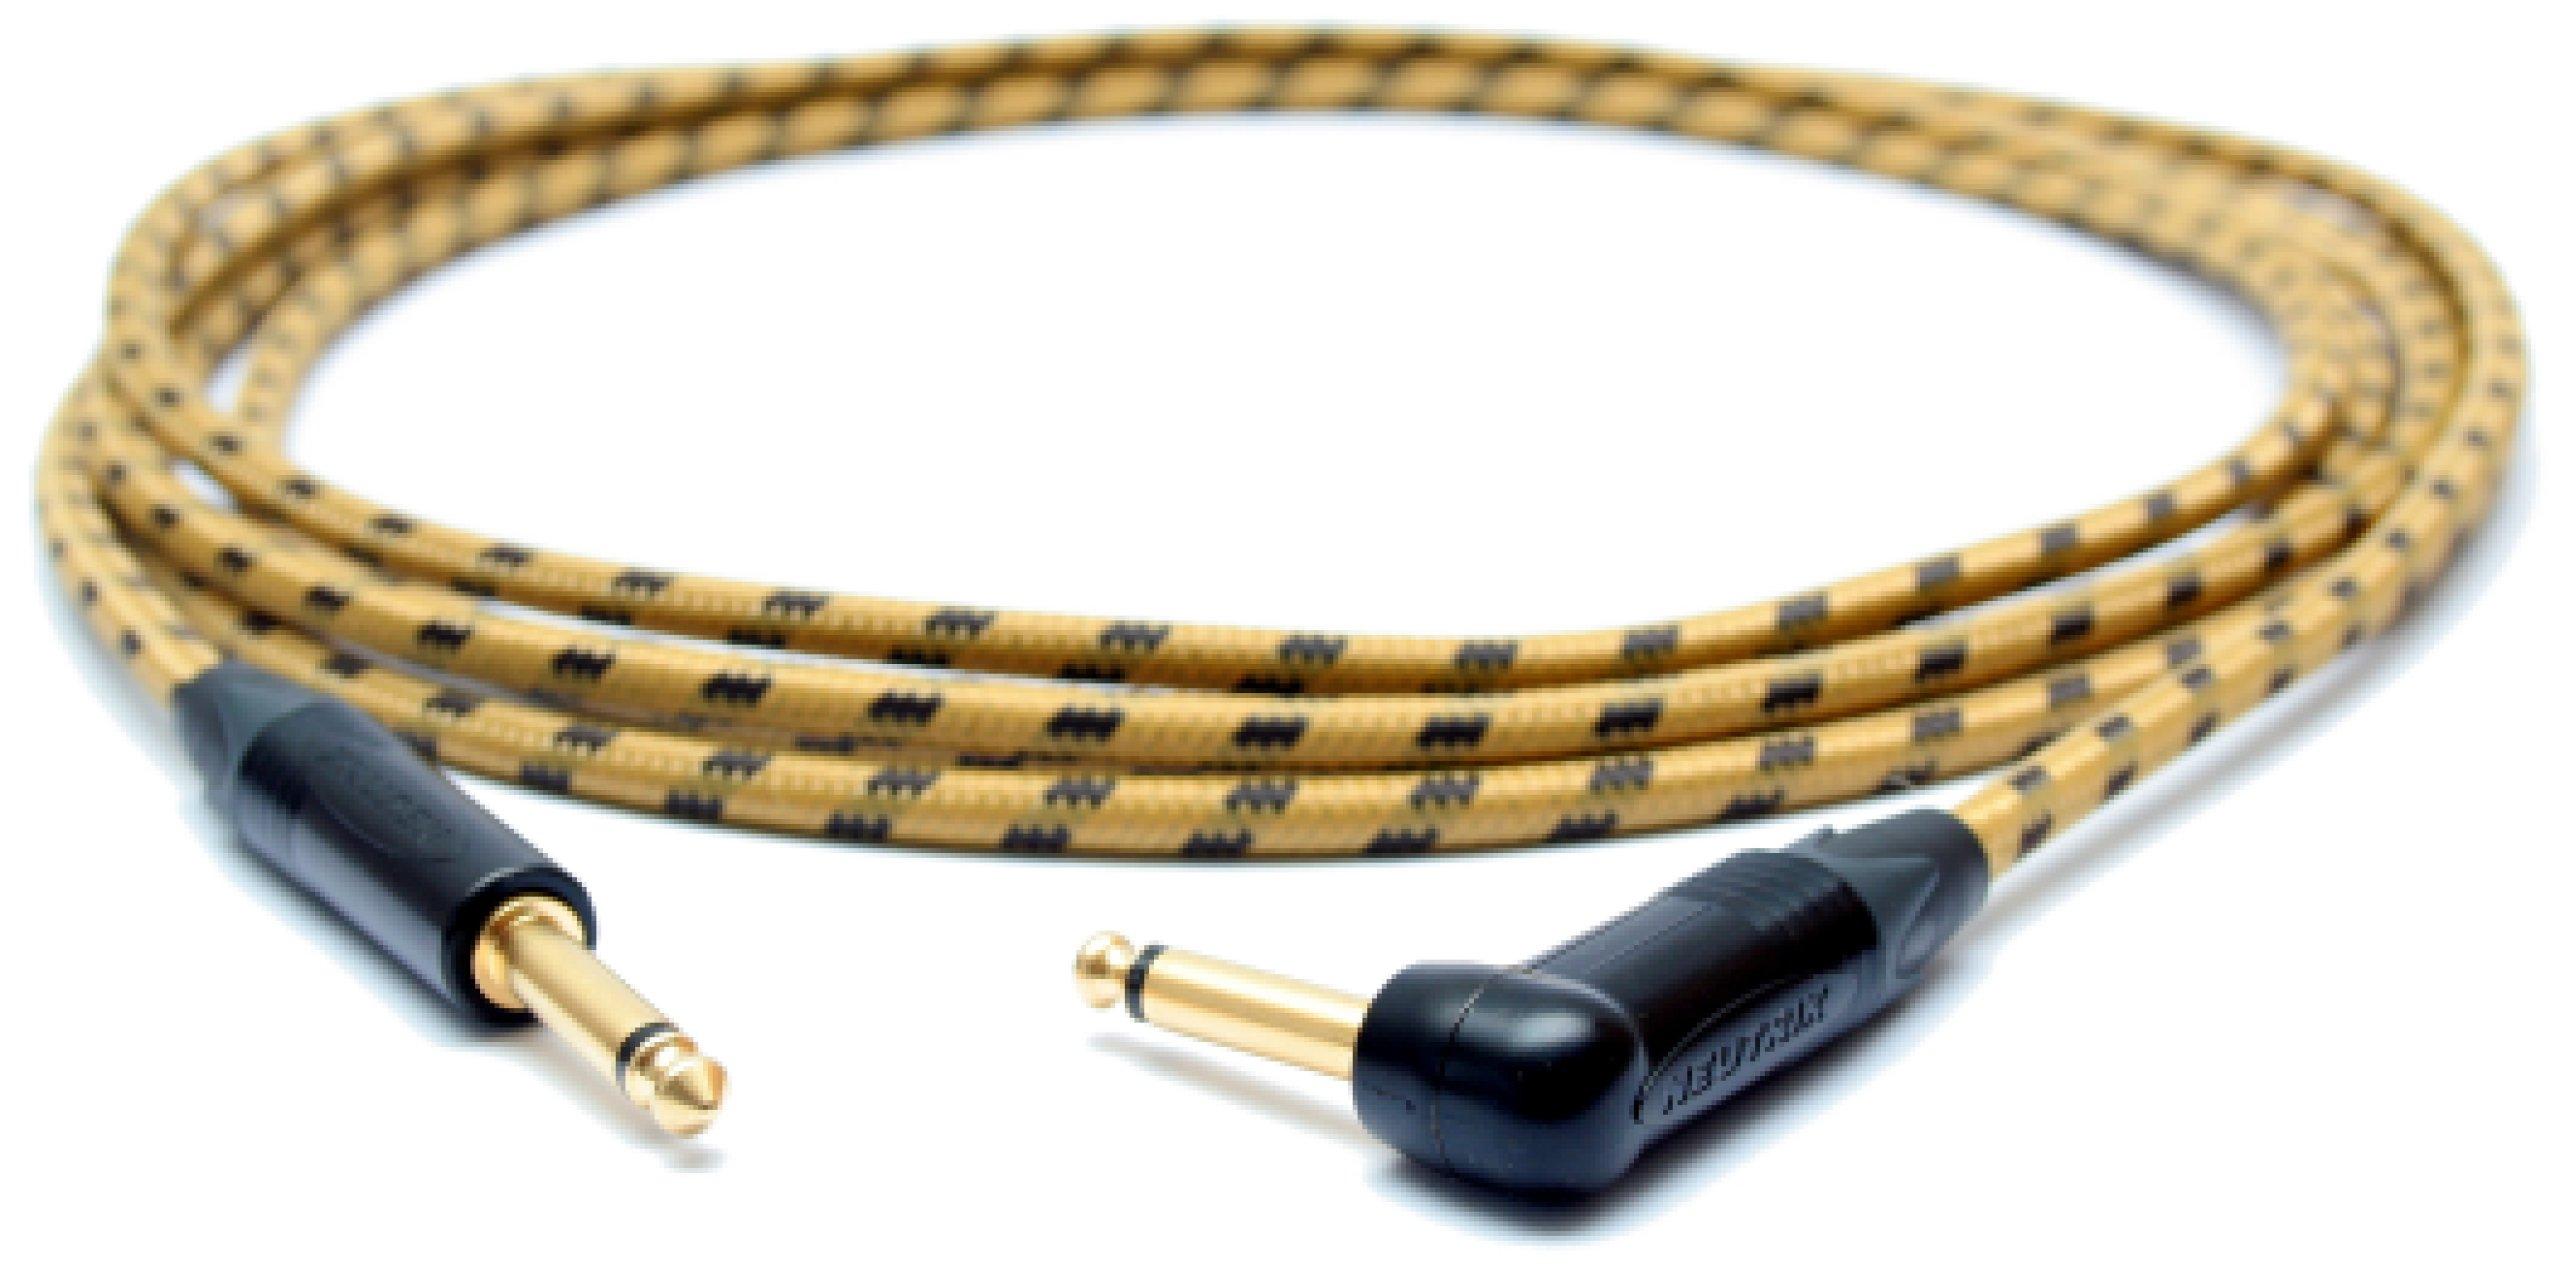 SOUNDSTAGE Kábel, 4M GITARA KÁBEL vintage TWEED